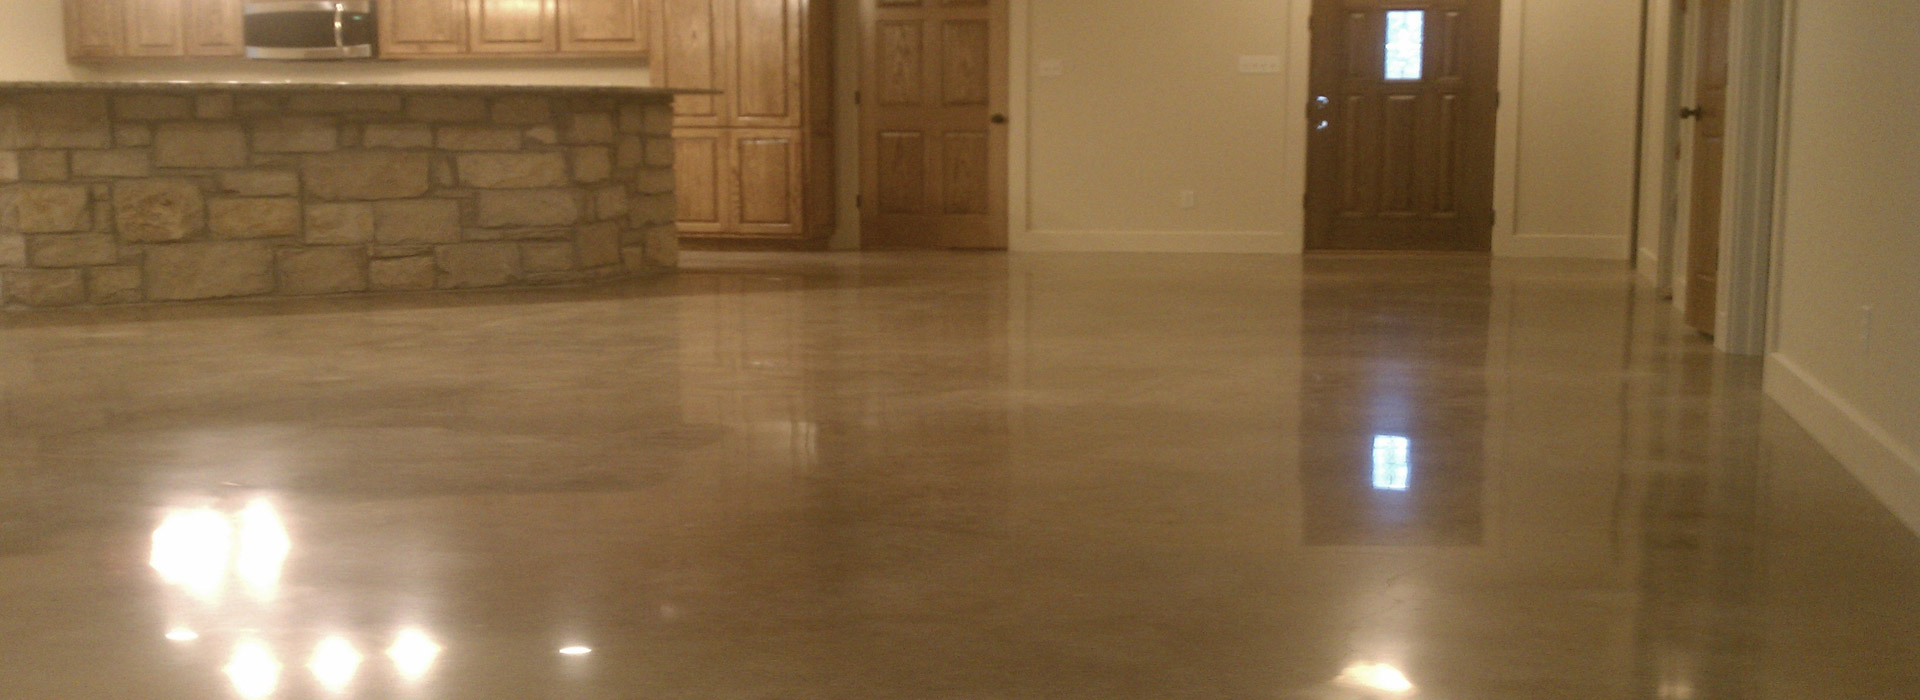 Stained concrete floors austin texas thefloors co for Texas floors